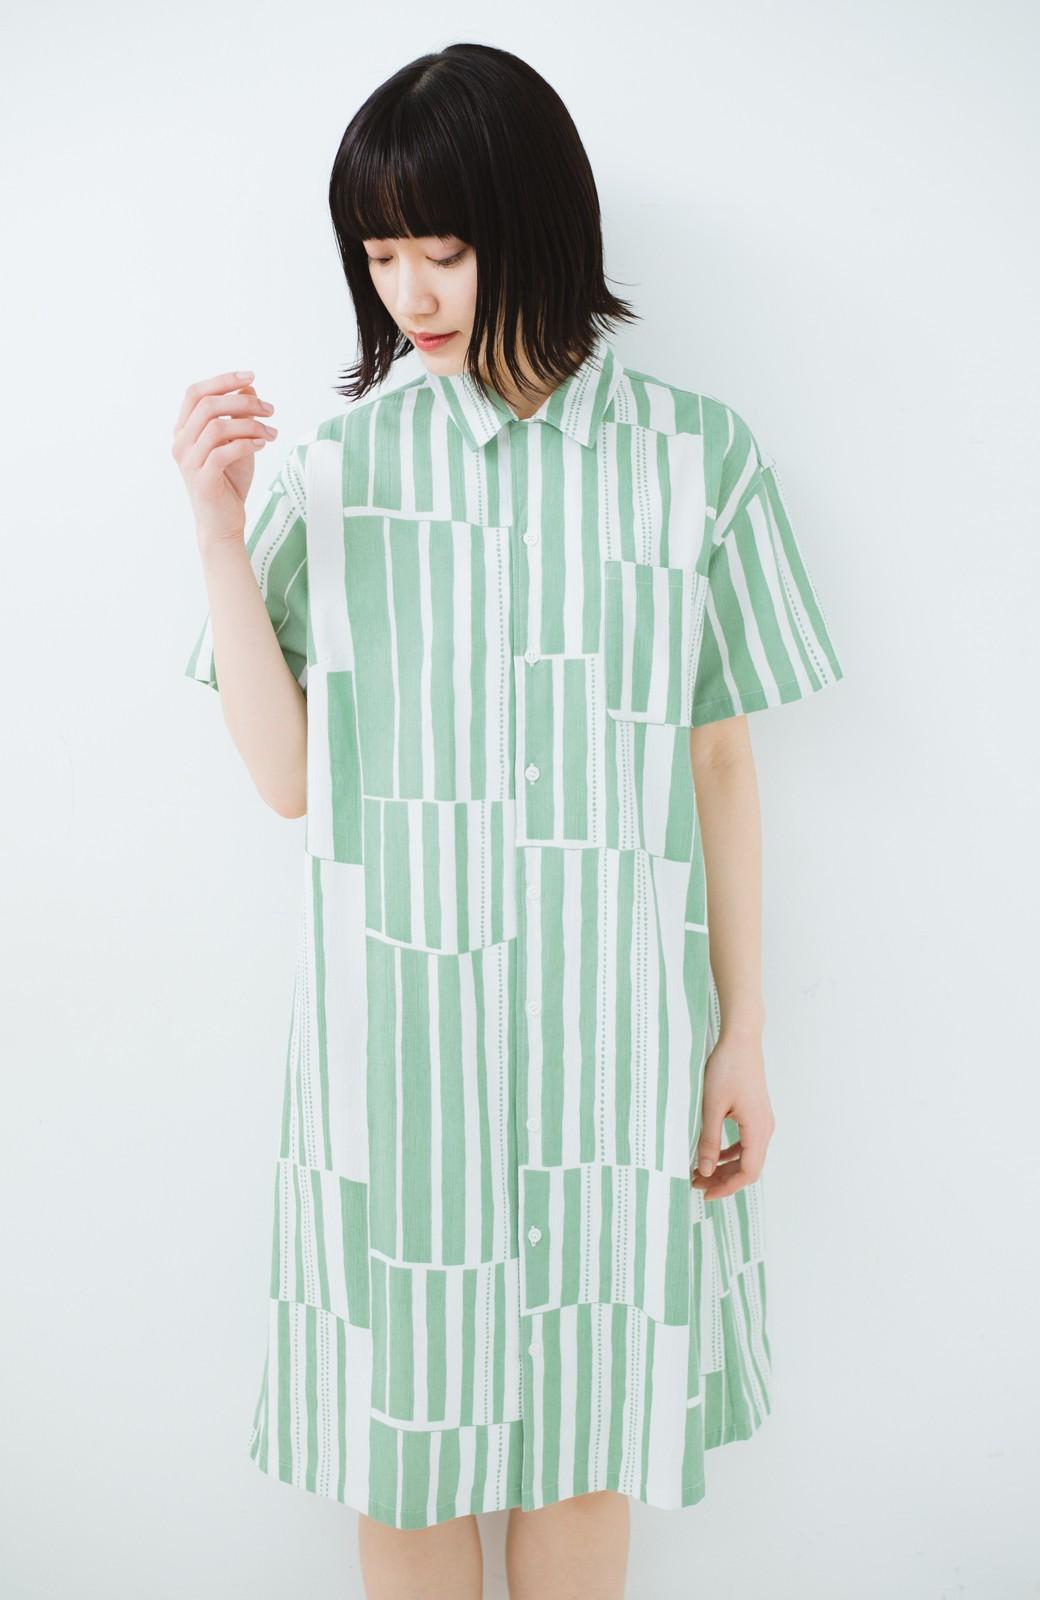 haco! 京都の浴衣屋さんと作った浴衣生地のシャツワンピース <グリーン系その他>の商品写真18